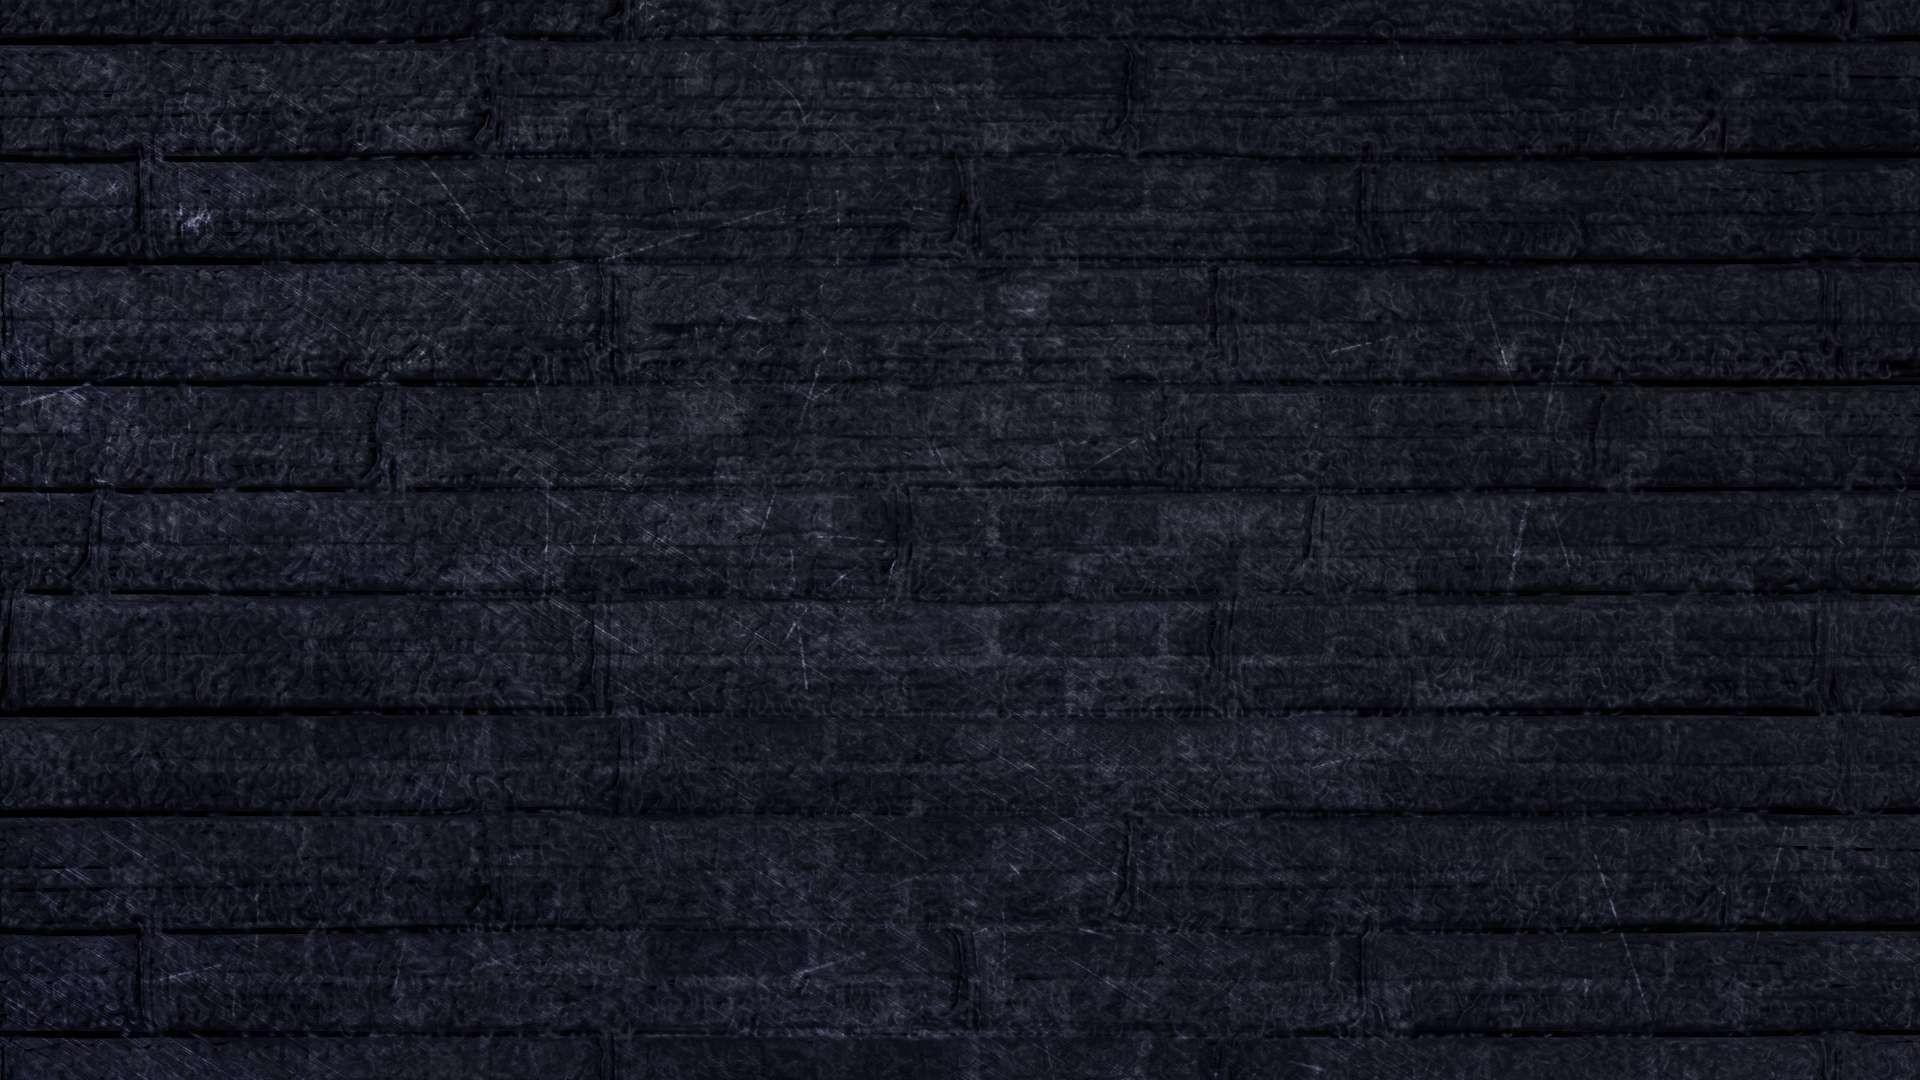 Basic HD Wallpaper